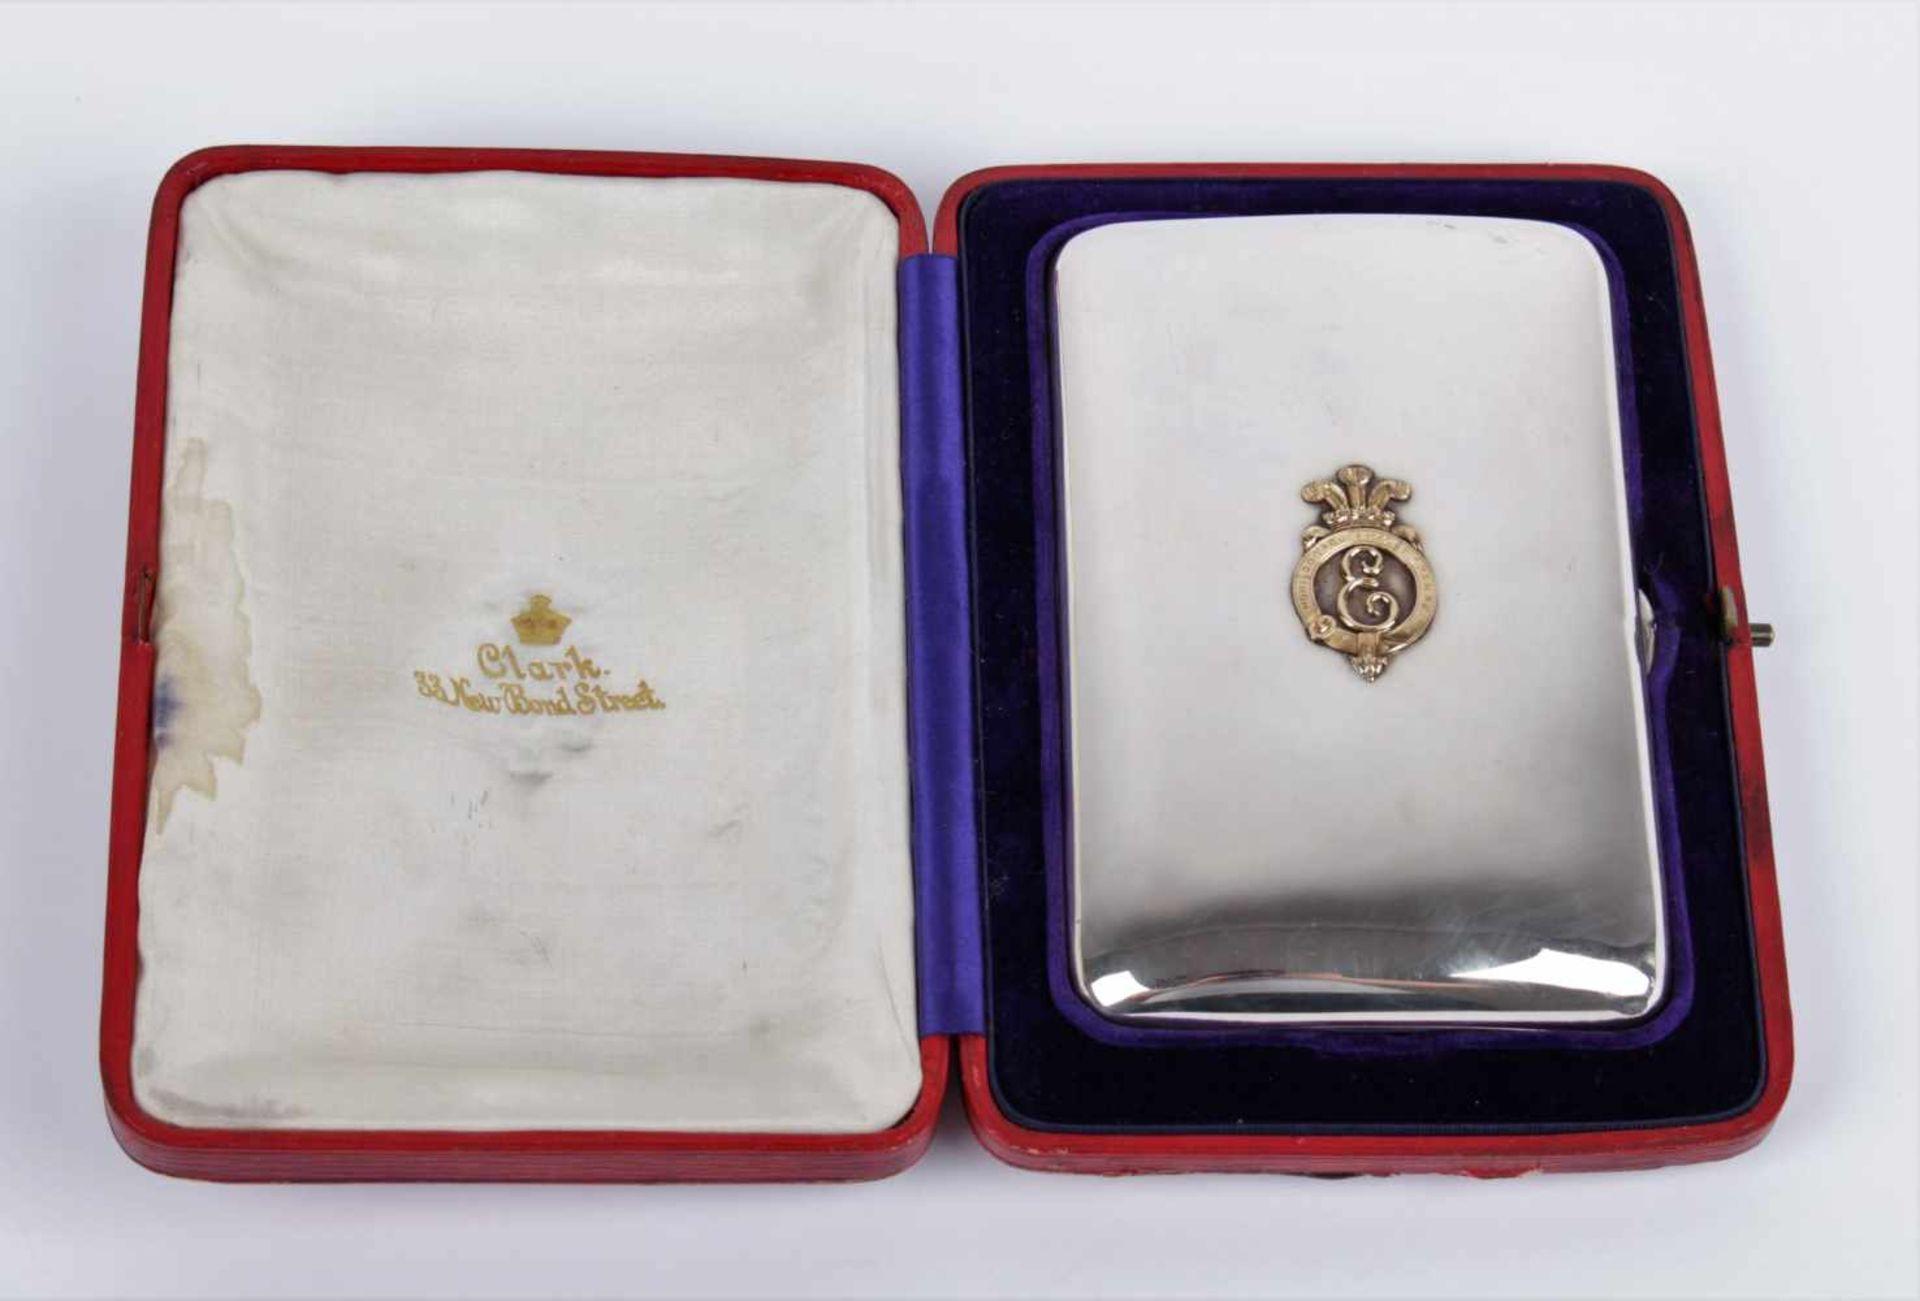 Los 53 - King´s Edward VIII silver cigar case Cigar case, silver 925/1000 and gold 585/1000, London, year